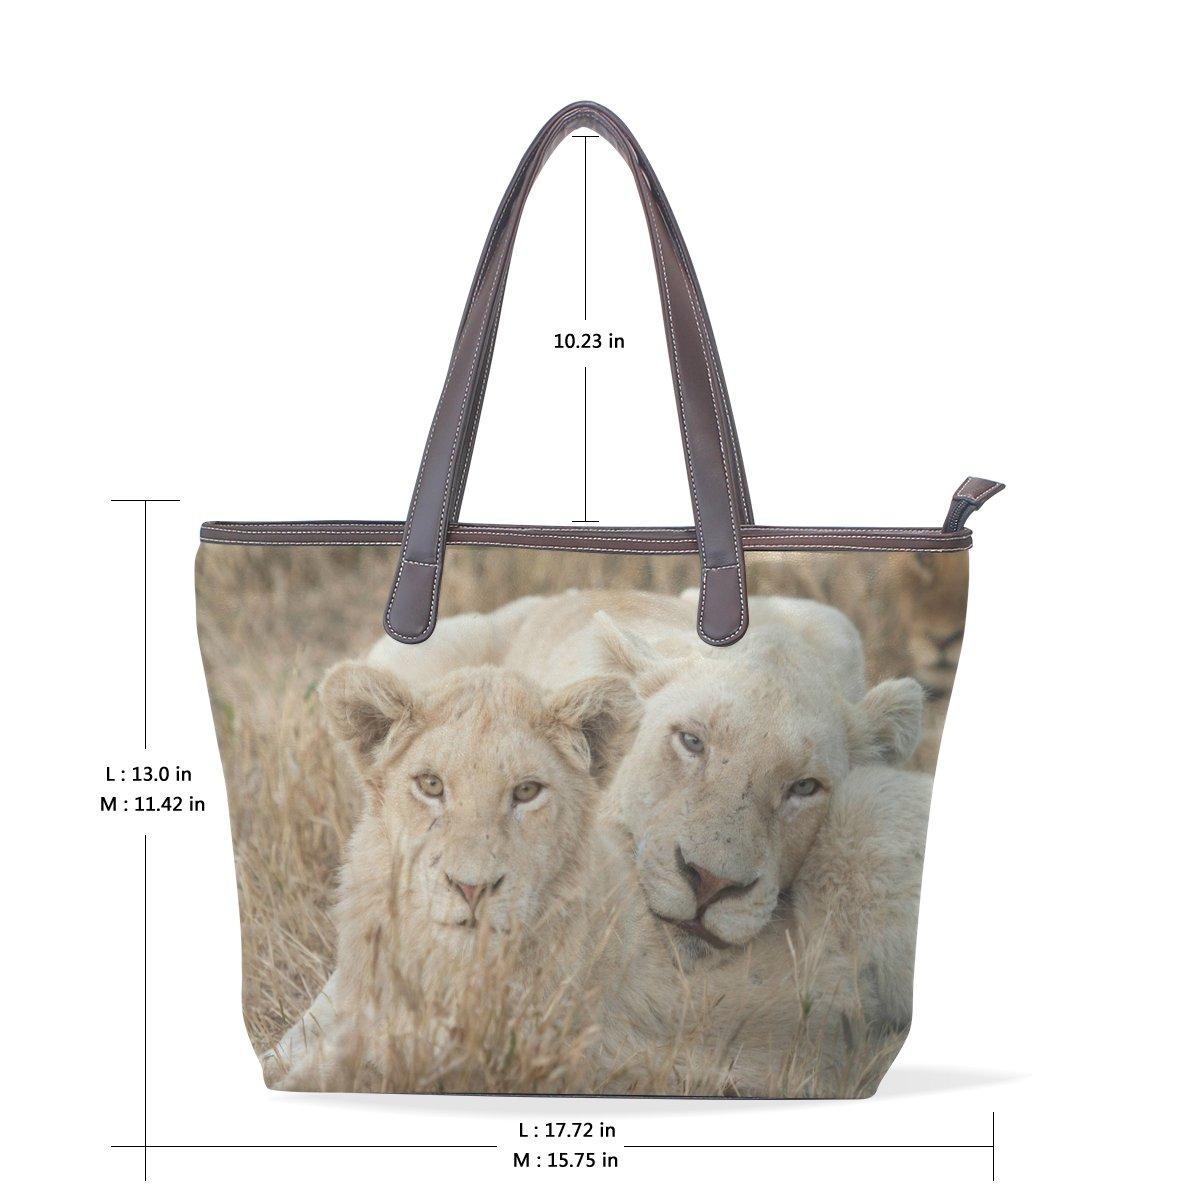 SCDS Lion Gaze PU Leather Lady Handbag Tote Bag Zipper Shoulder Bag